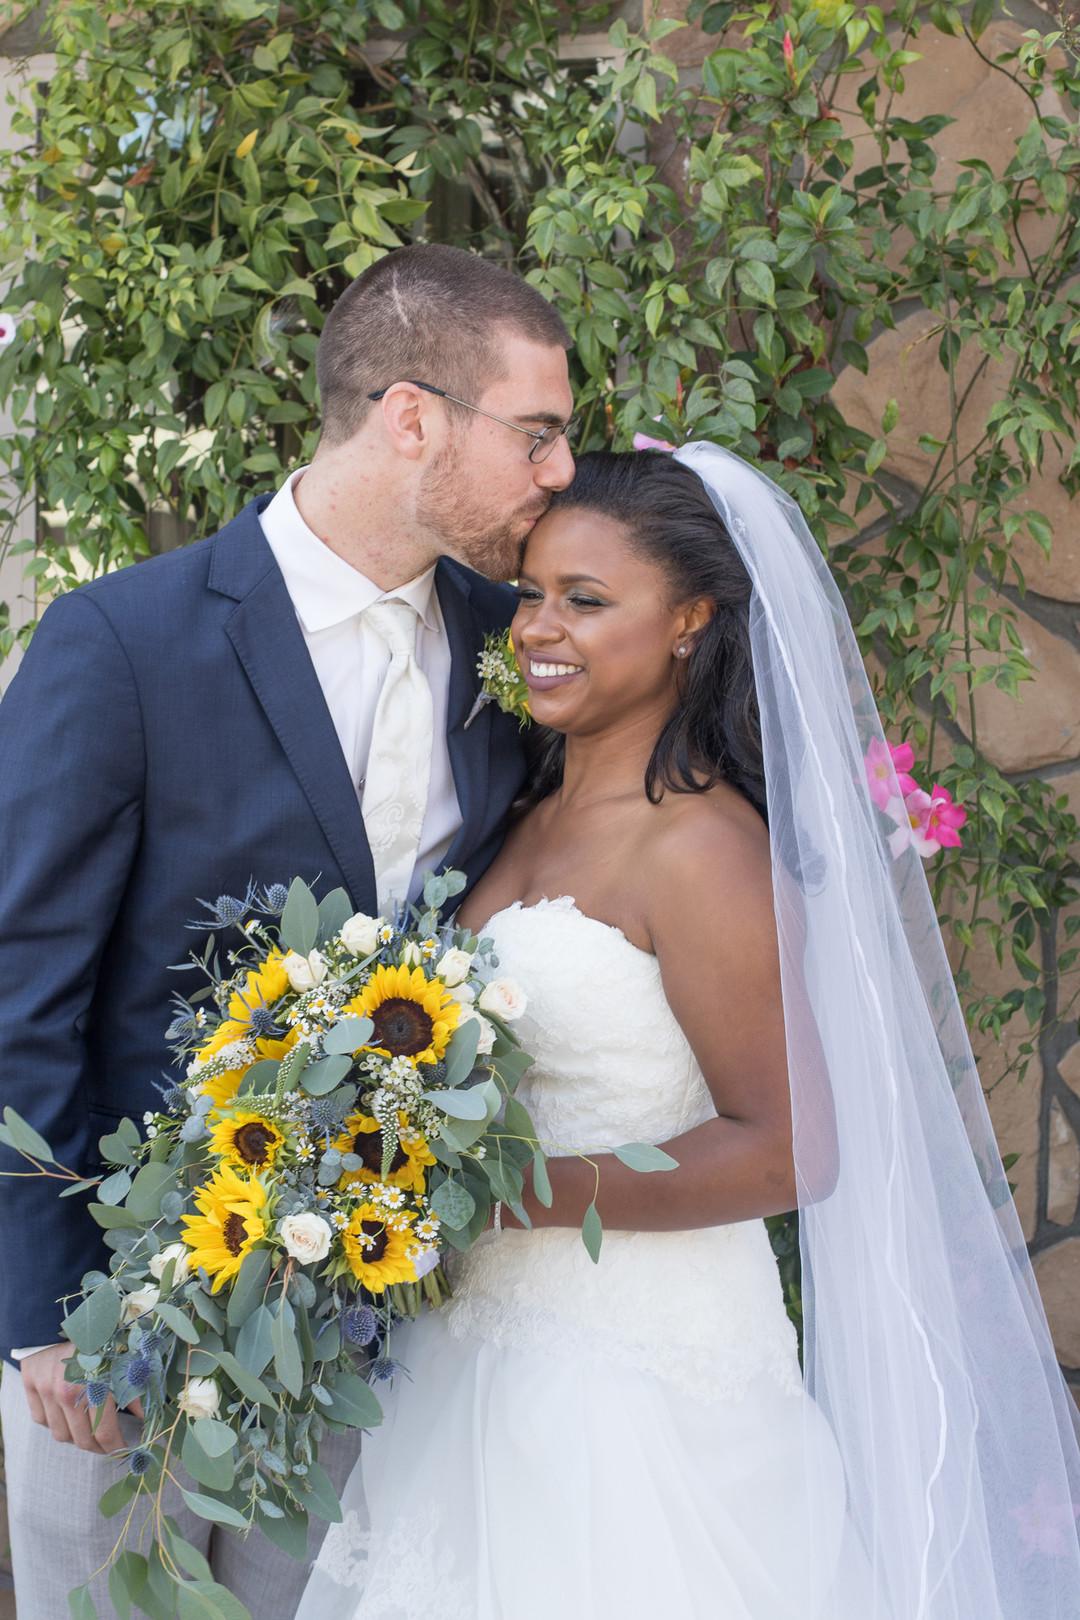 www.santabarbarawedding.com | Renoda Campbell | Weddings by Bobbie | Ventana Grill Events | Bride and Groom